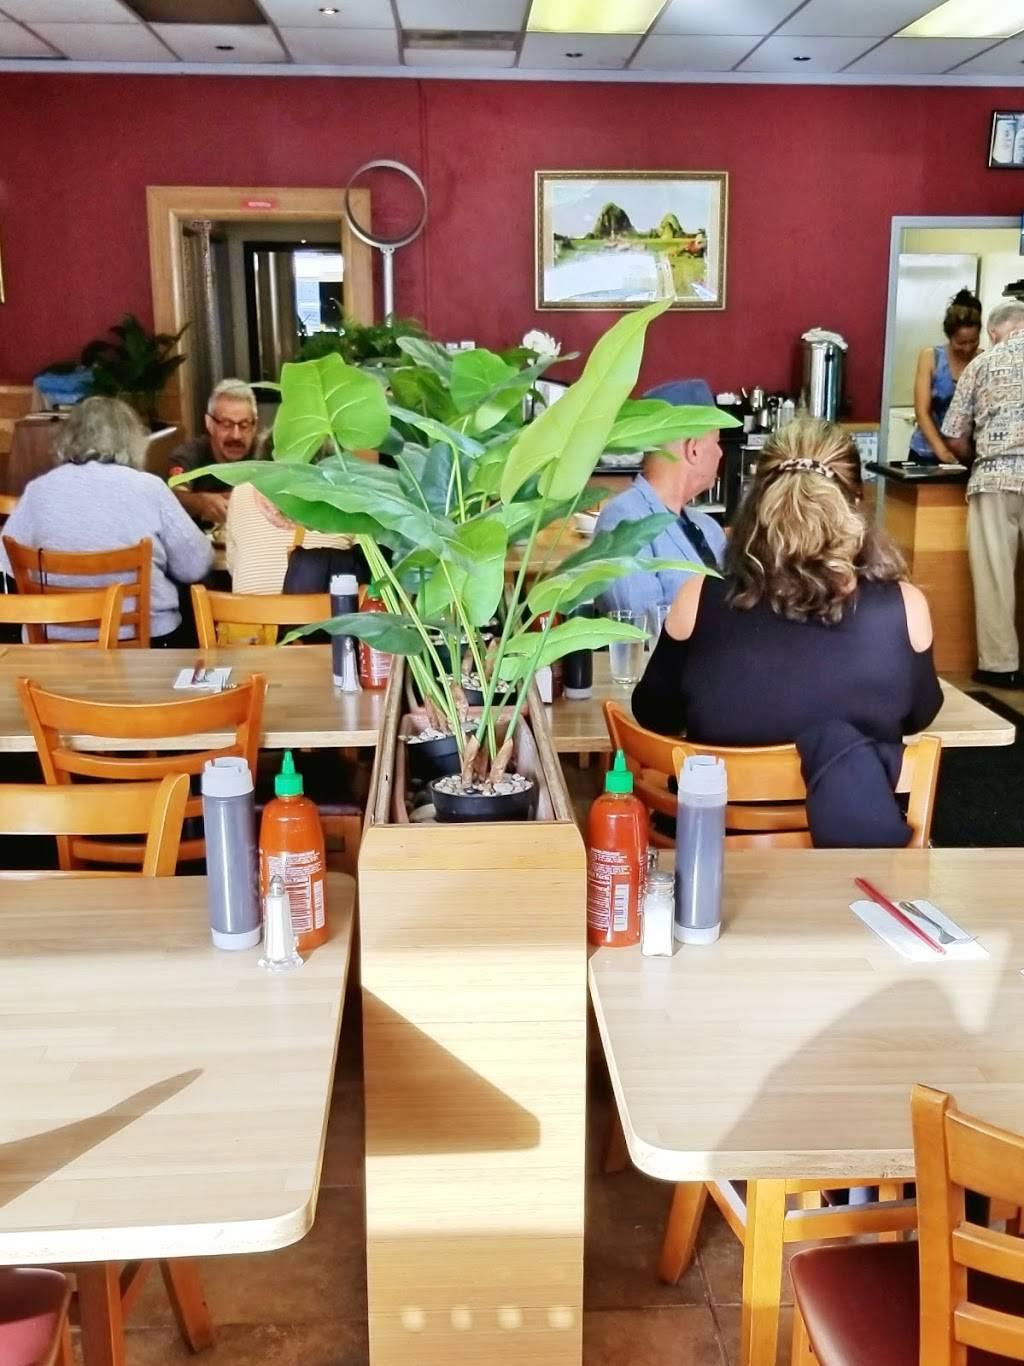 Dà Nẵng Restaurant   restaurant   905 San Pablo Ave, Albany, CA 94706, USA   5103564813 OR +1 510-356-4813